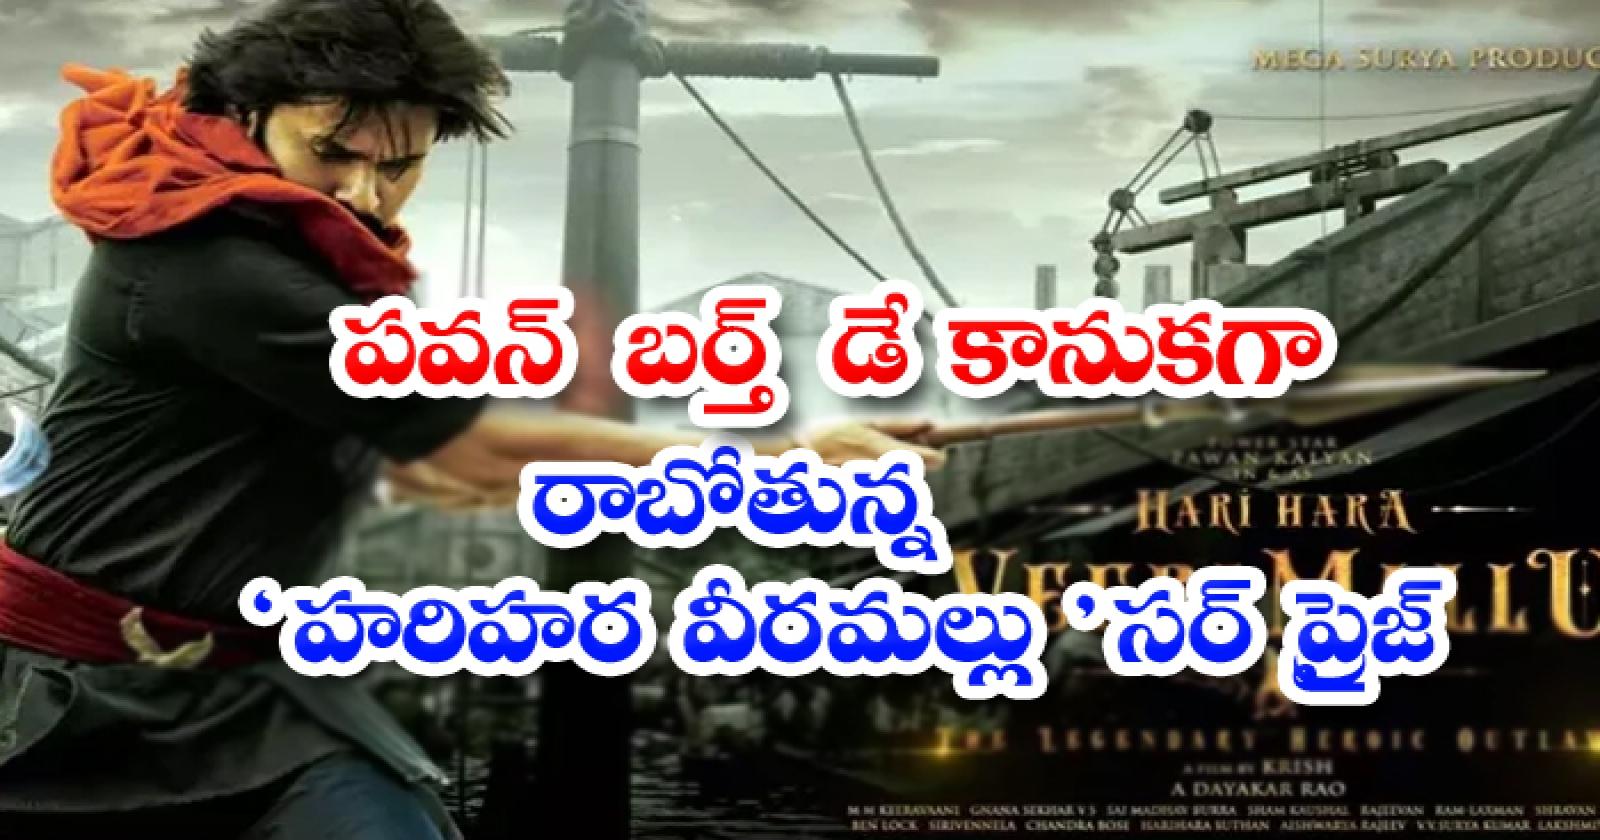 Pawan Kalyan Hari Hara Veeramallu Movie Teaser For Birthday-పవన్ బర్త్ డే కానుకగా రాబోతున్న హరిహర వీరమల్లు' సర్ ప్రైజ్-Latest News - Telugu-Telugu Tollywood Photo Image-TeluguStop.com